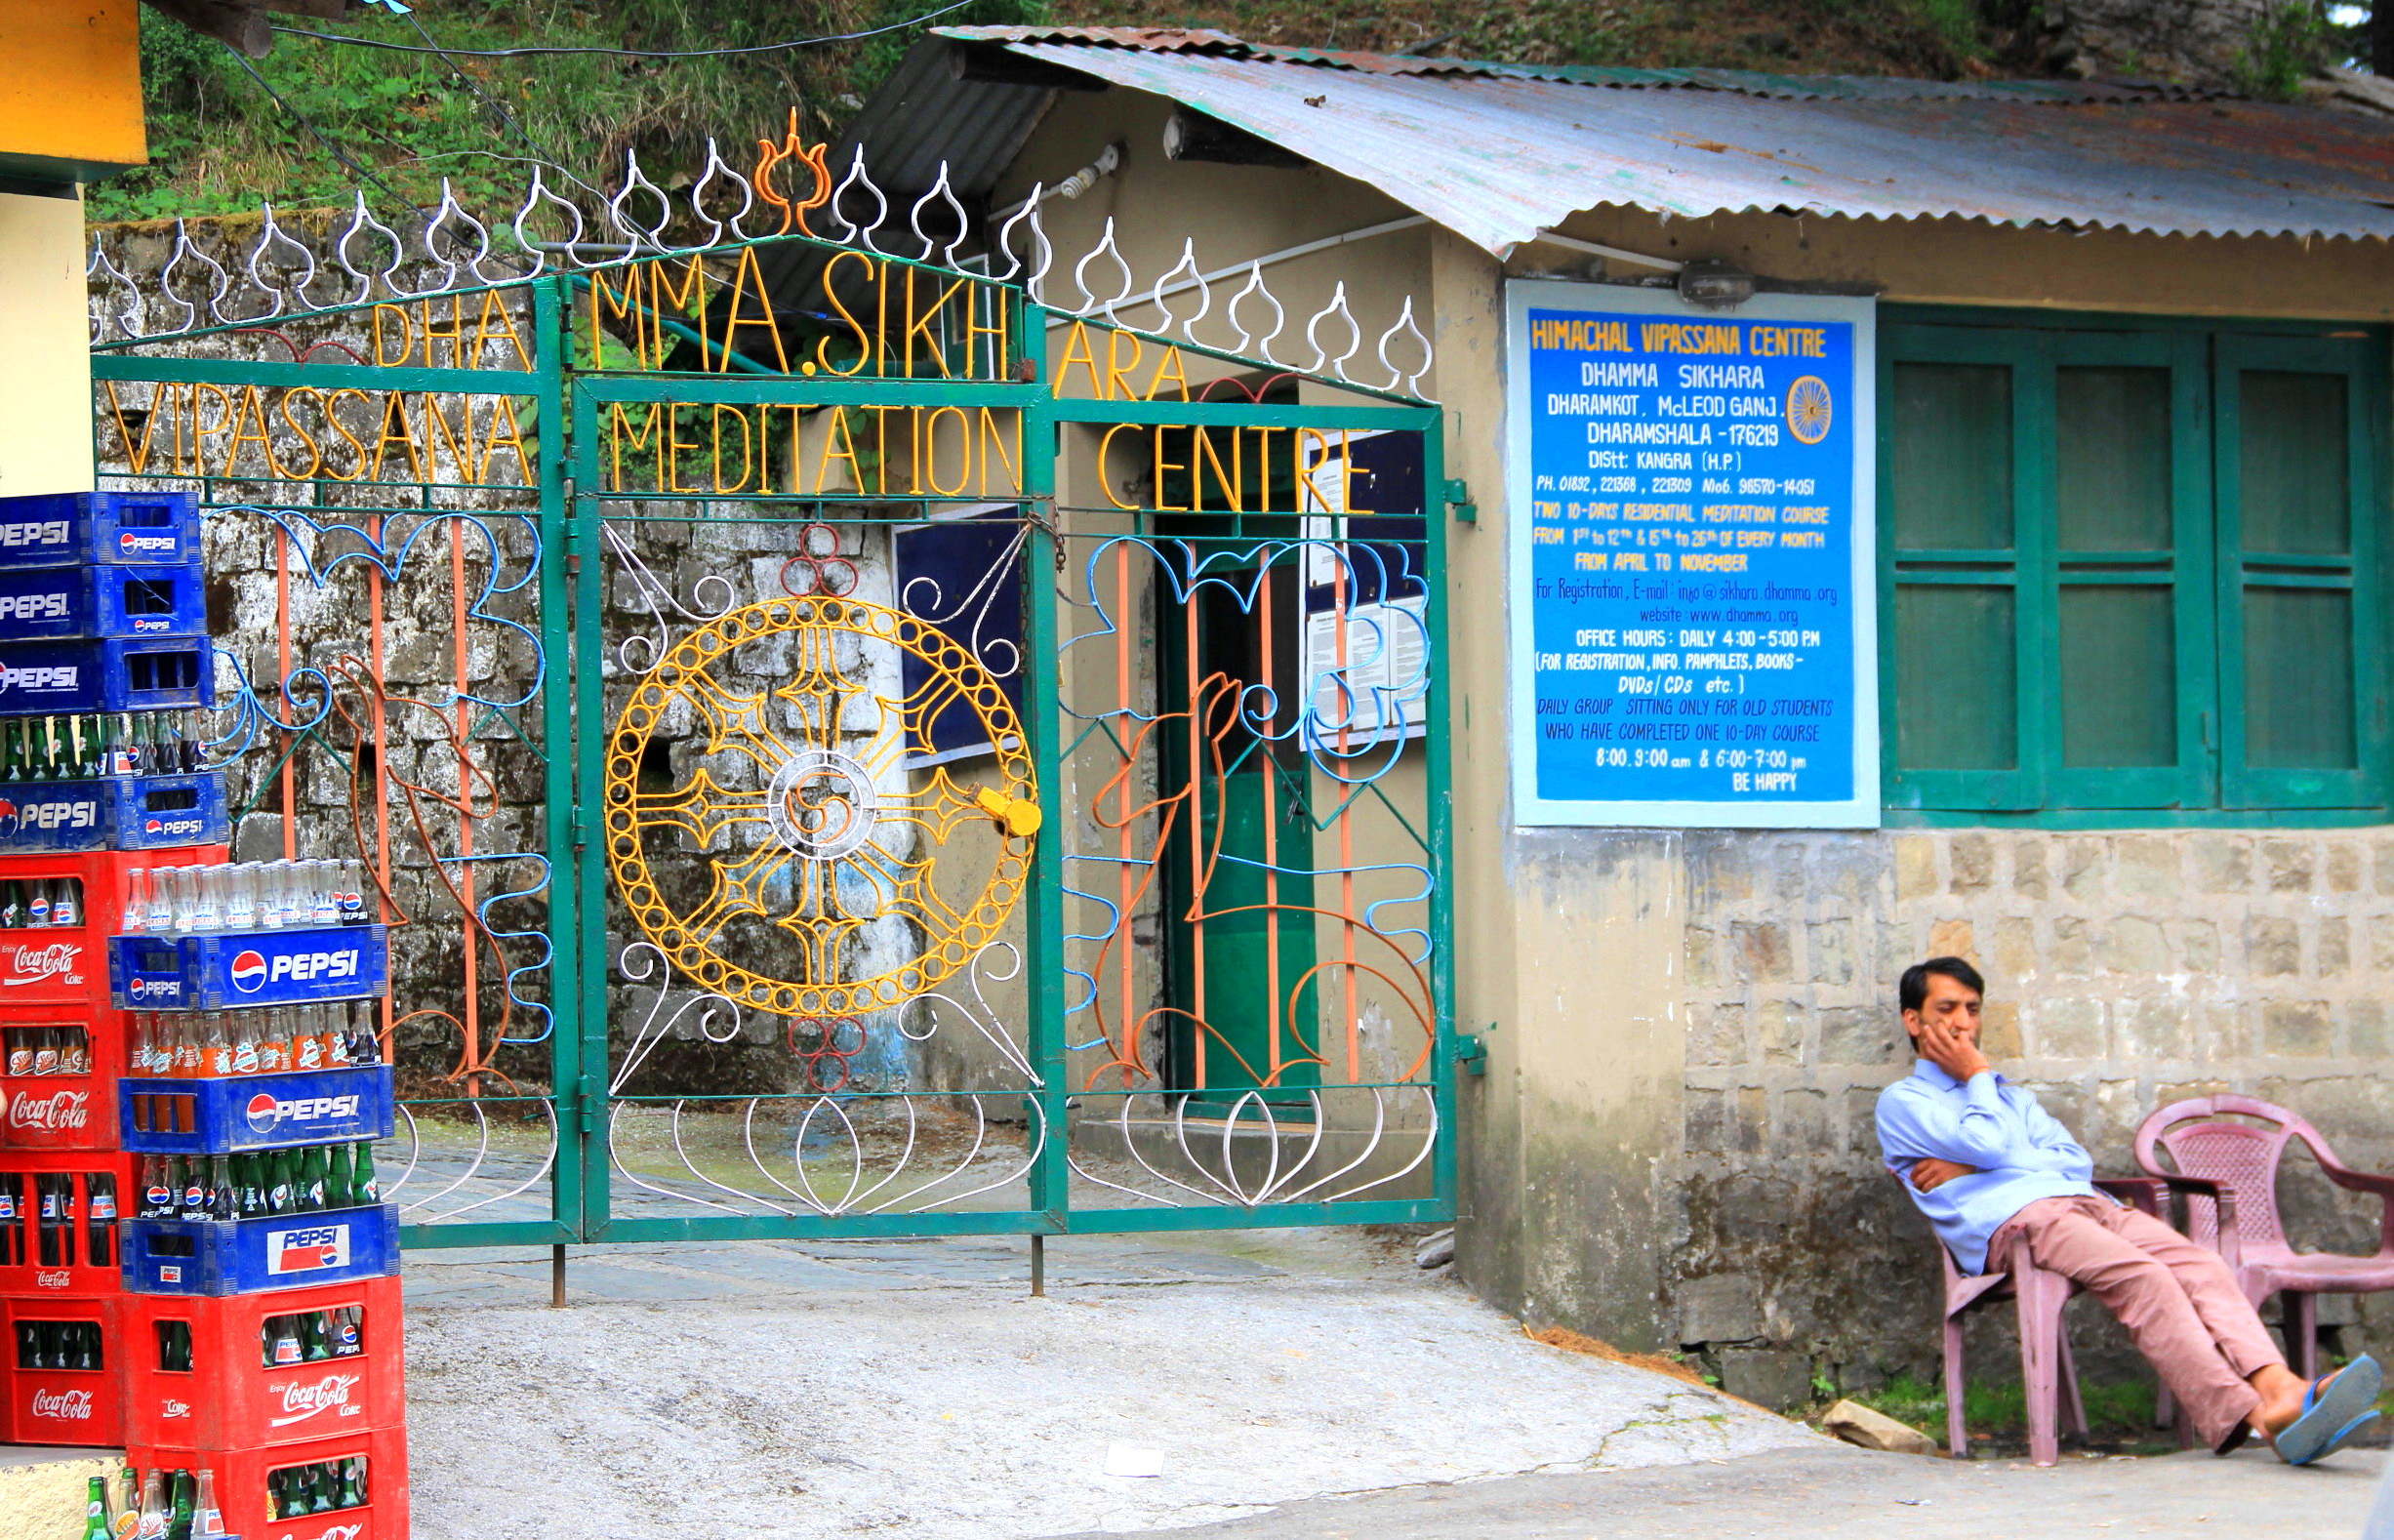 Vipassana meditation centre in Dharamkot, McLeod Ganj, Dharamsala, India